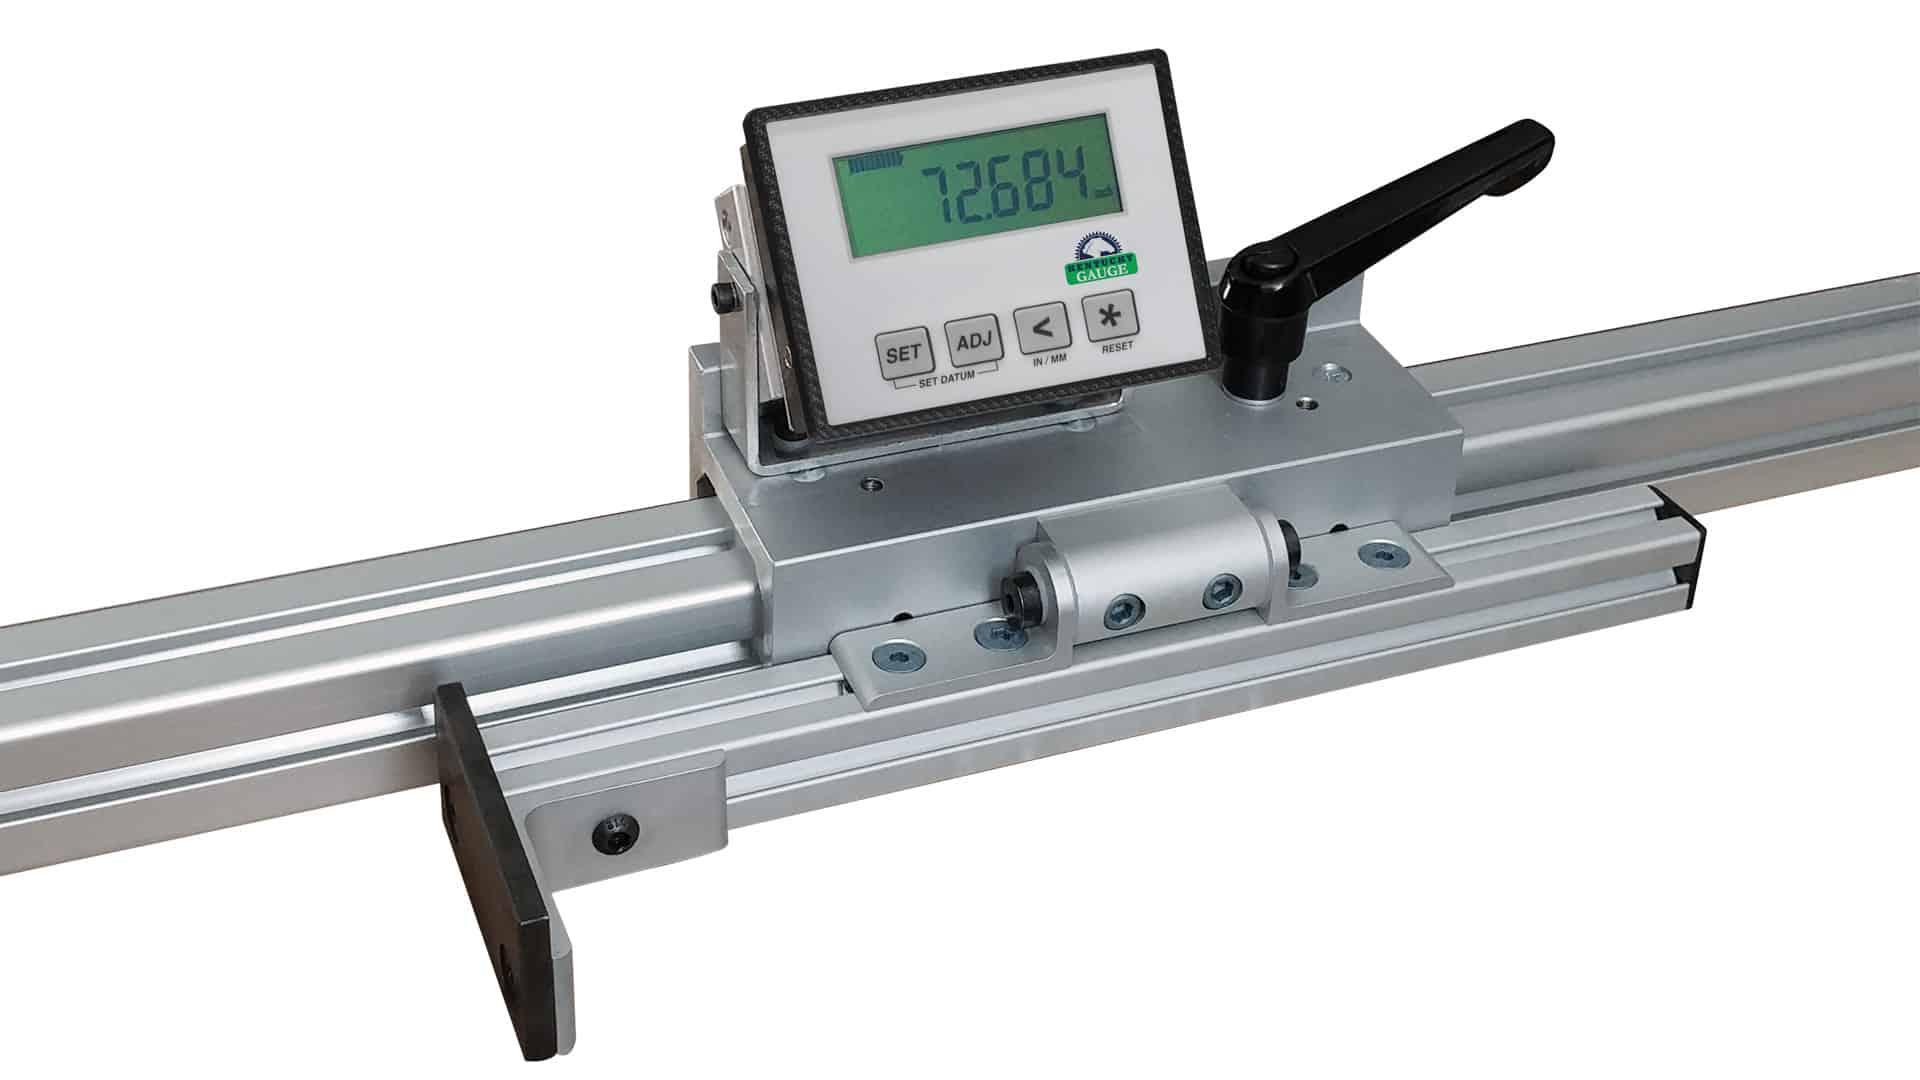 MD10D - Digital Length Stop System